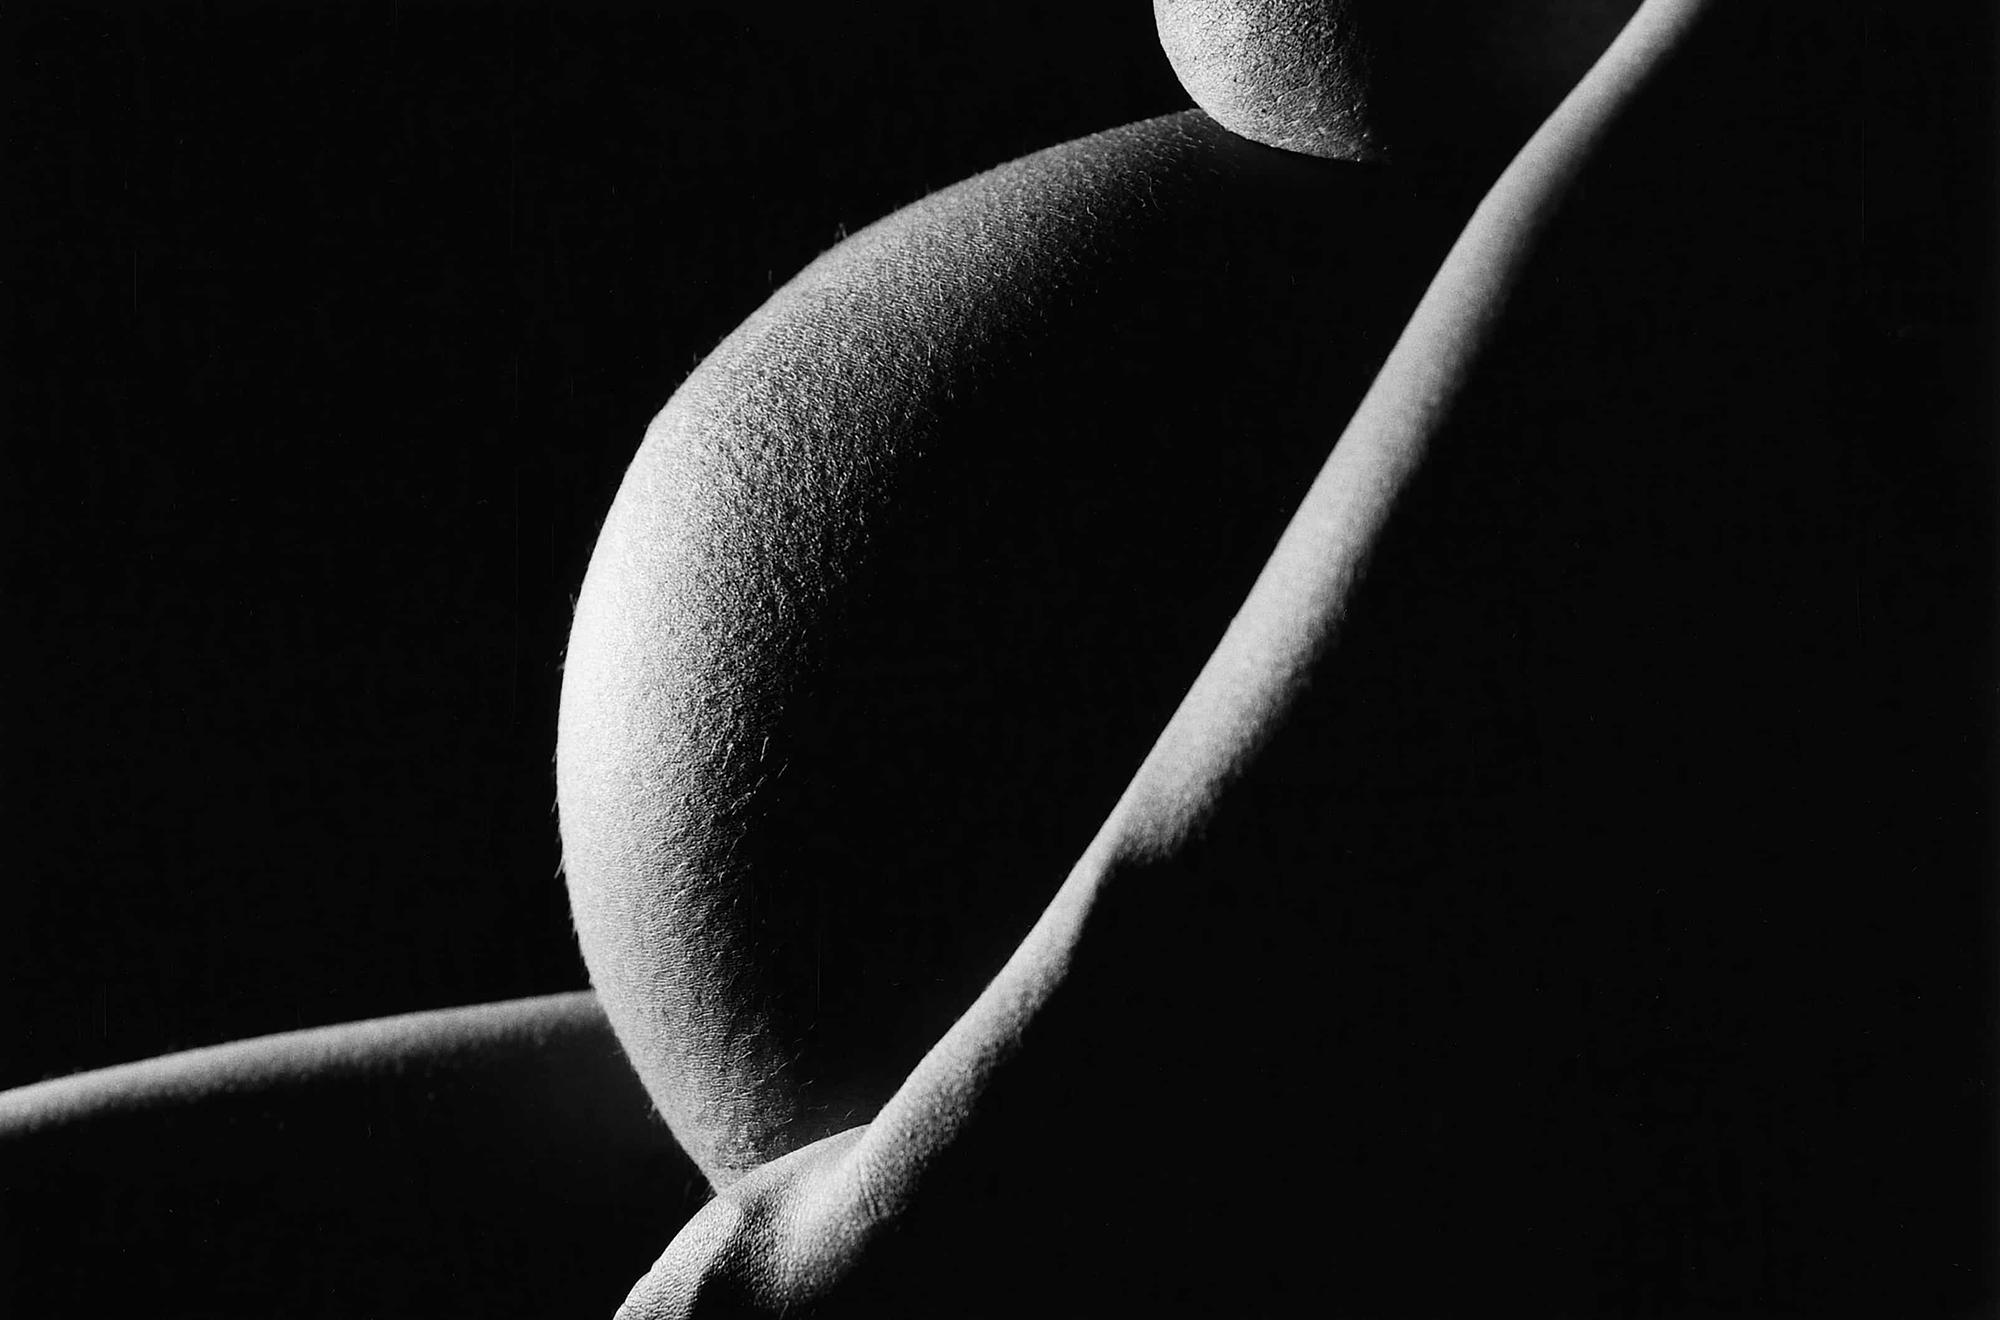 Femme enceinte moon